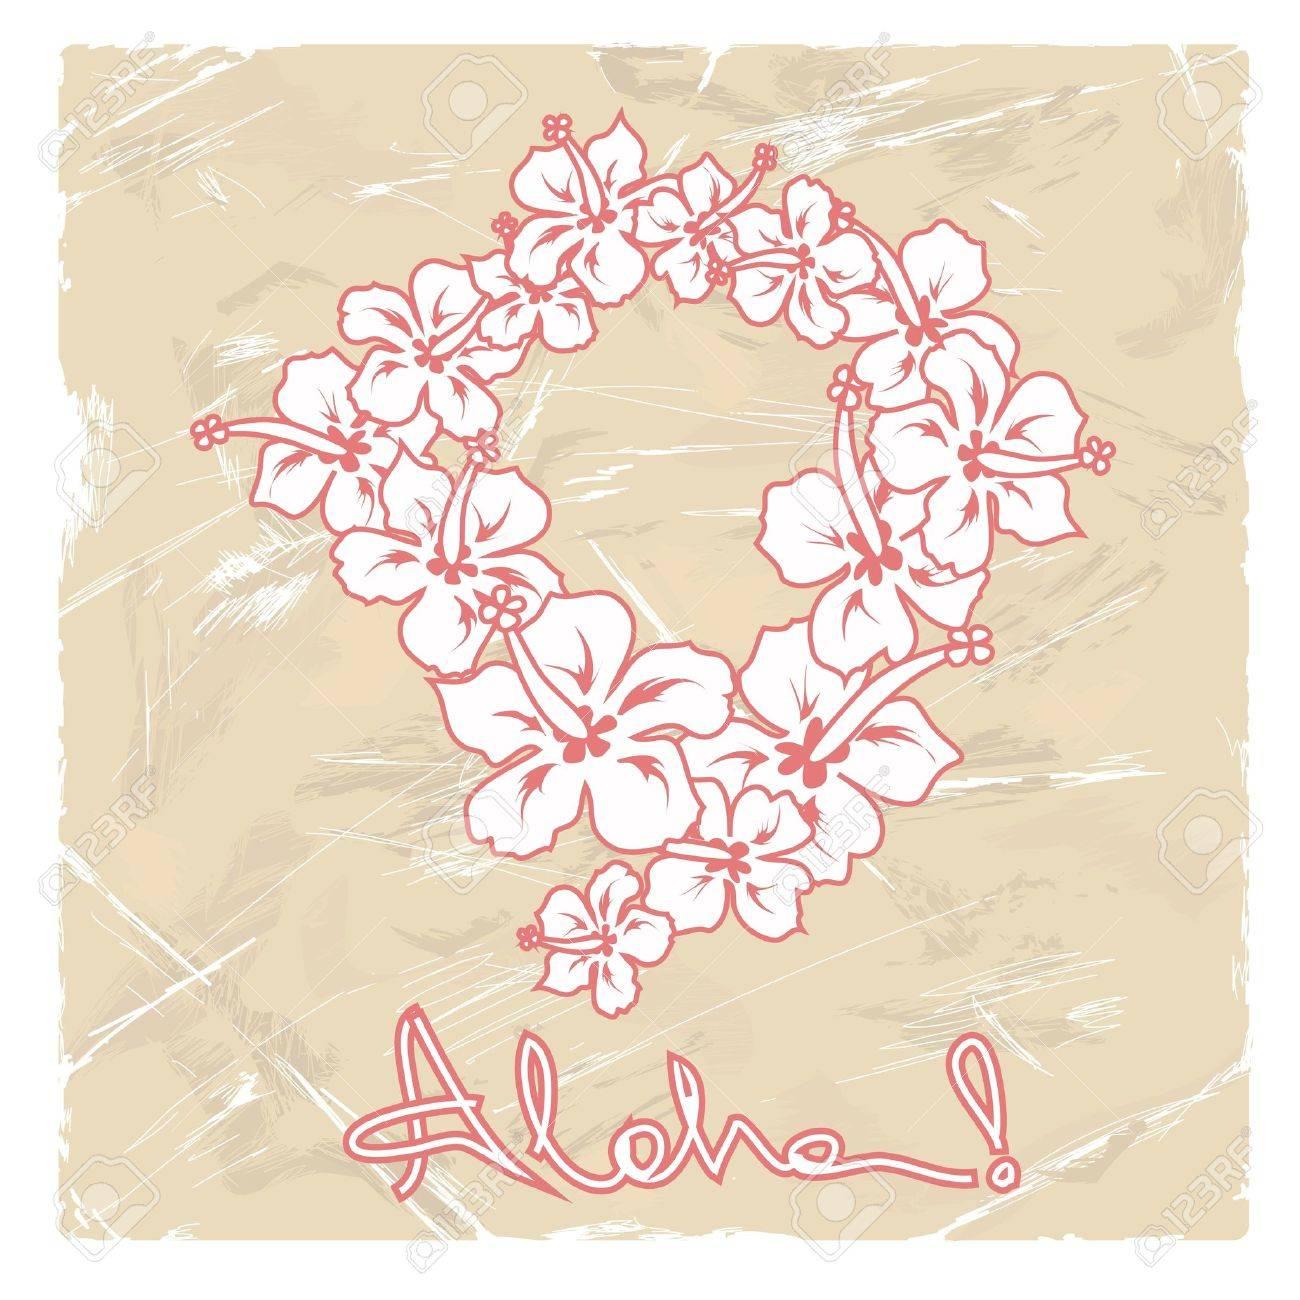 Illustration of hawaiian flower garland on a retro background illustration of hawaiian flower garland on a retro background stock vector 18853657 izmirmasajfo